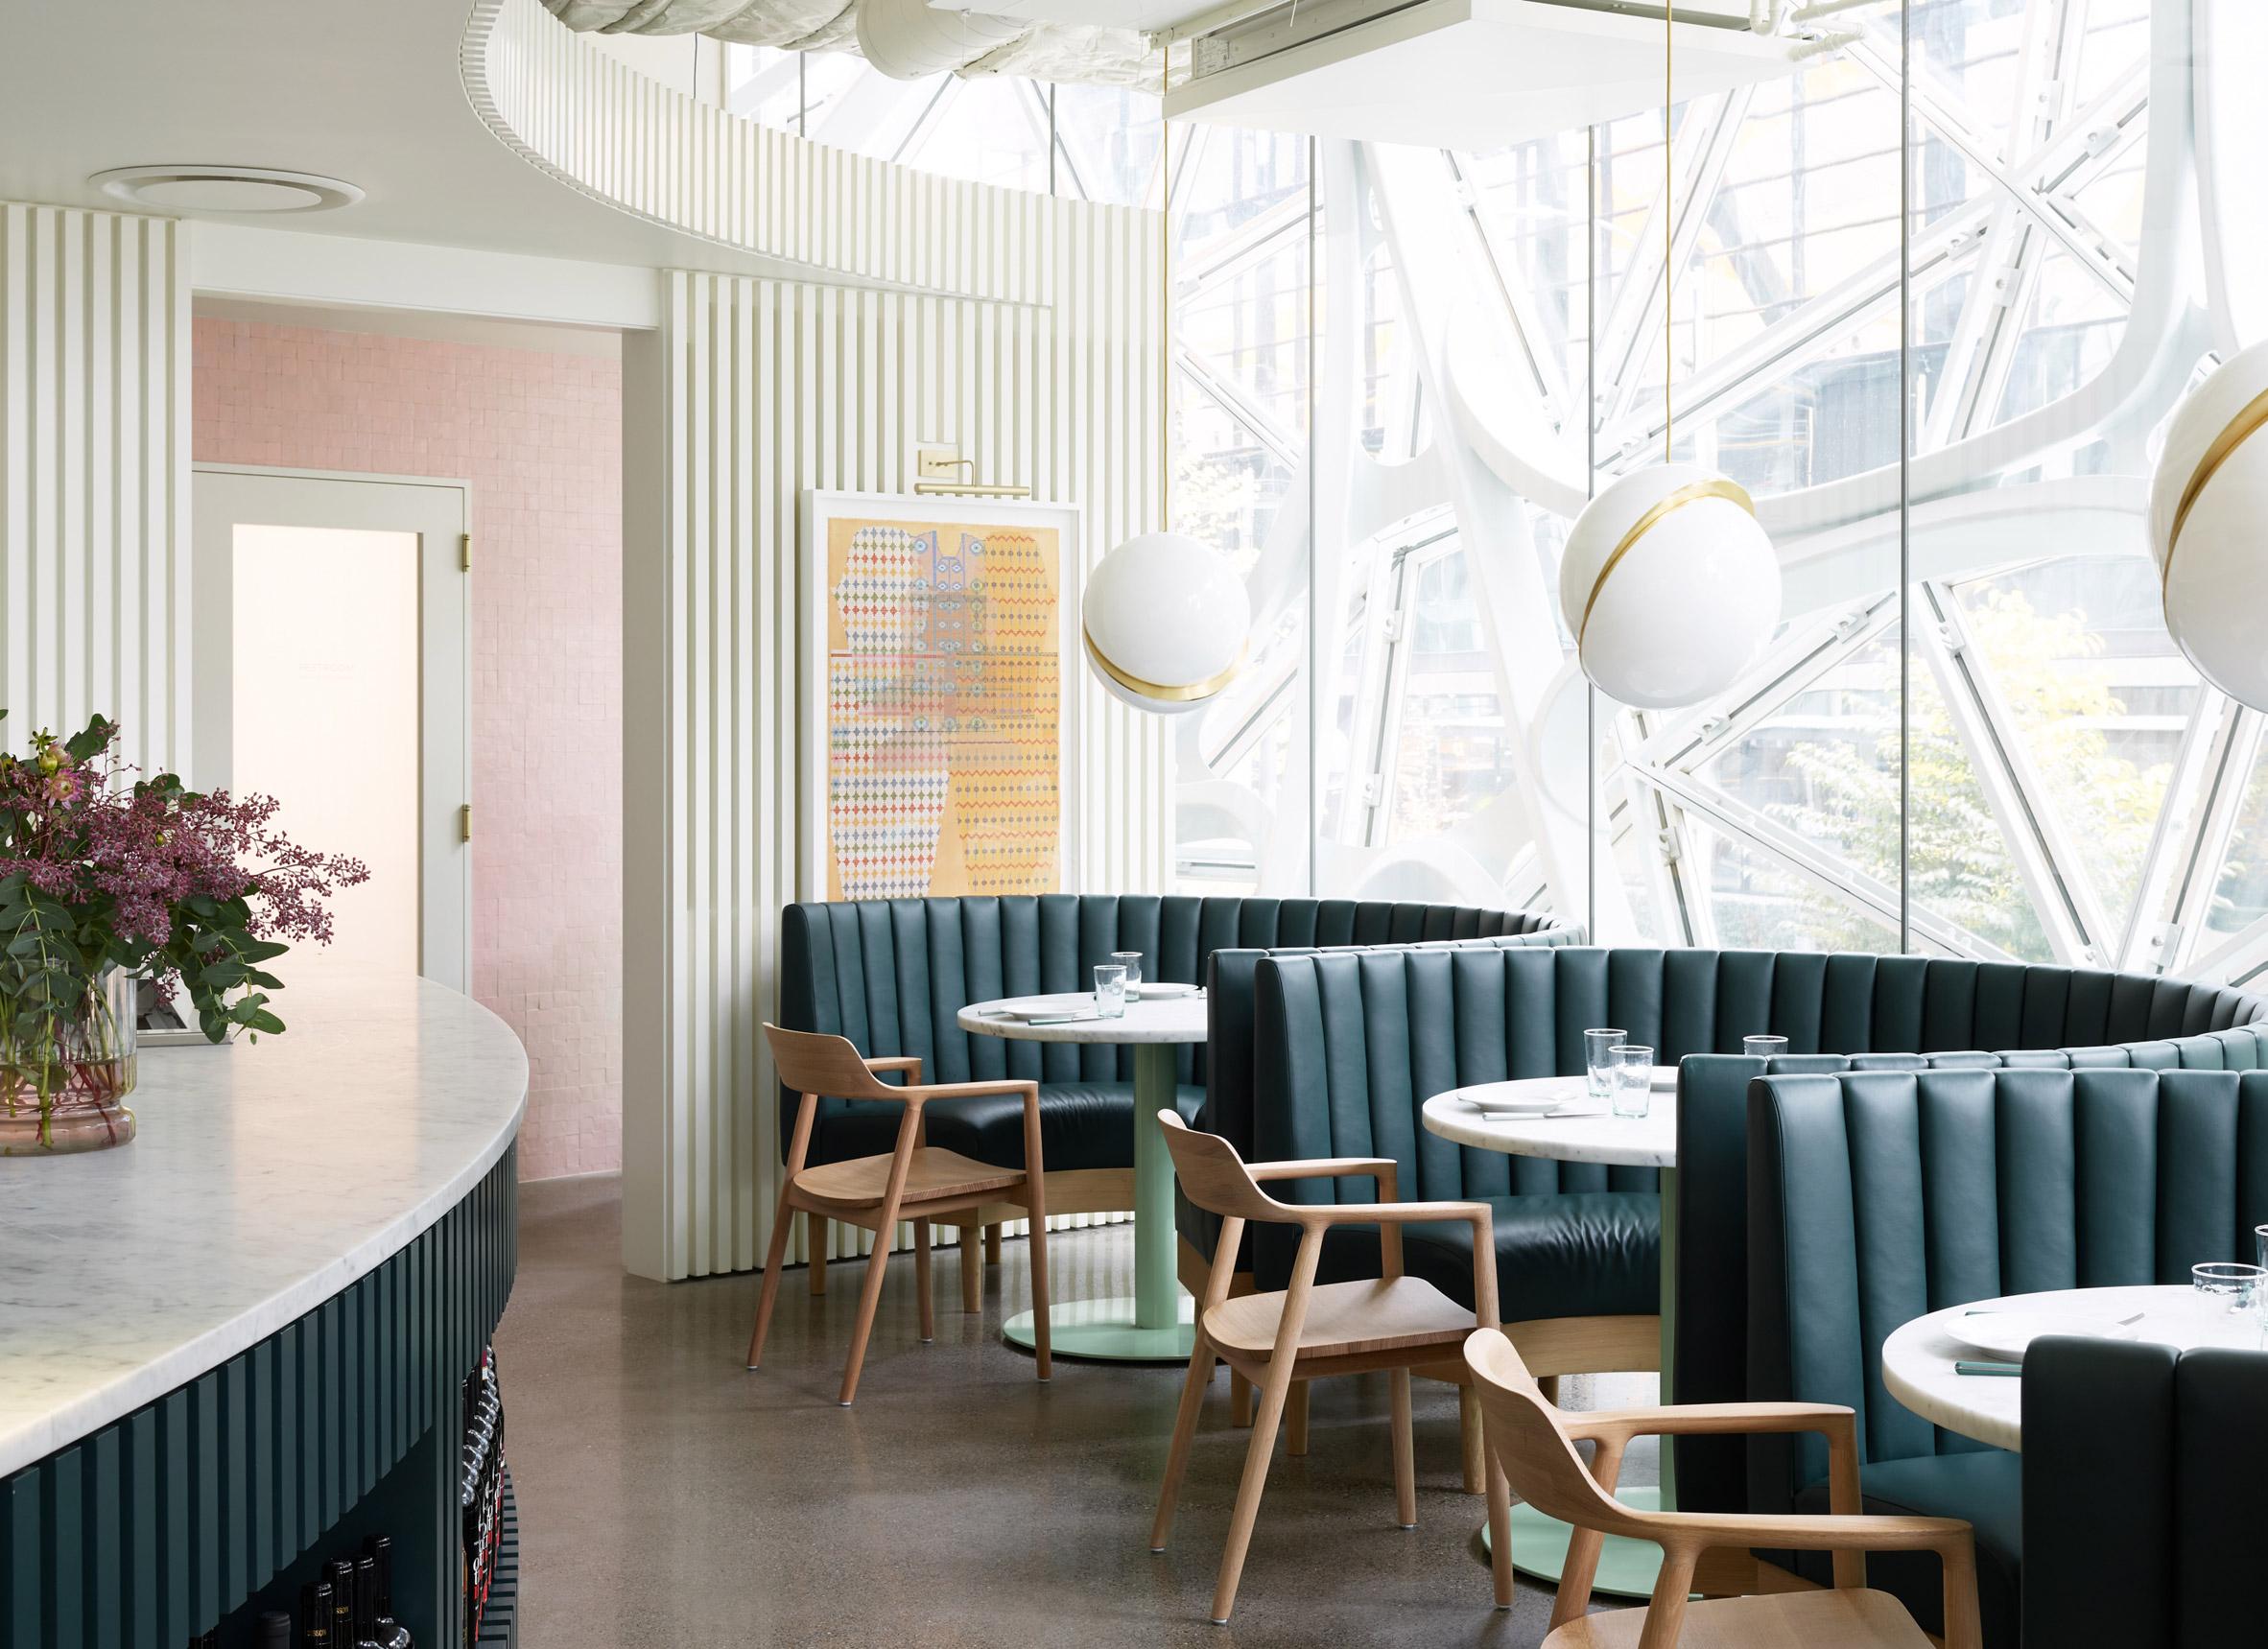 willmotts-ghost-restaurant-price-erickson-interior-seattle-washington-us_dezeen_2364_col_0.jpg